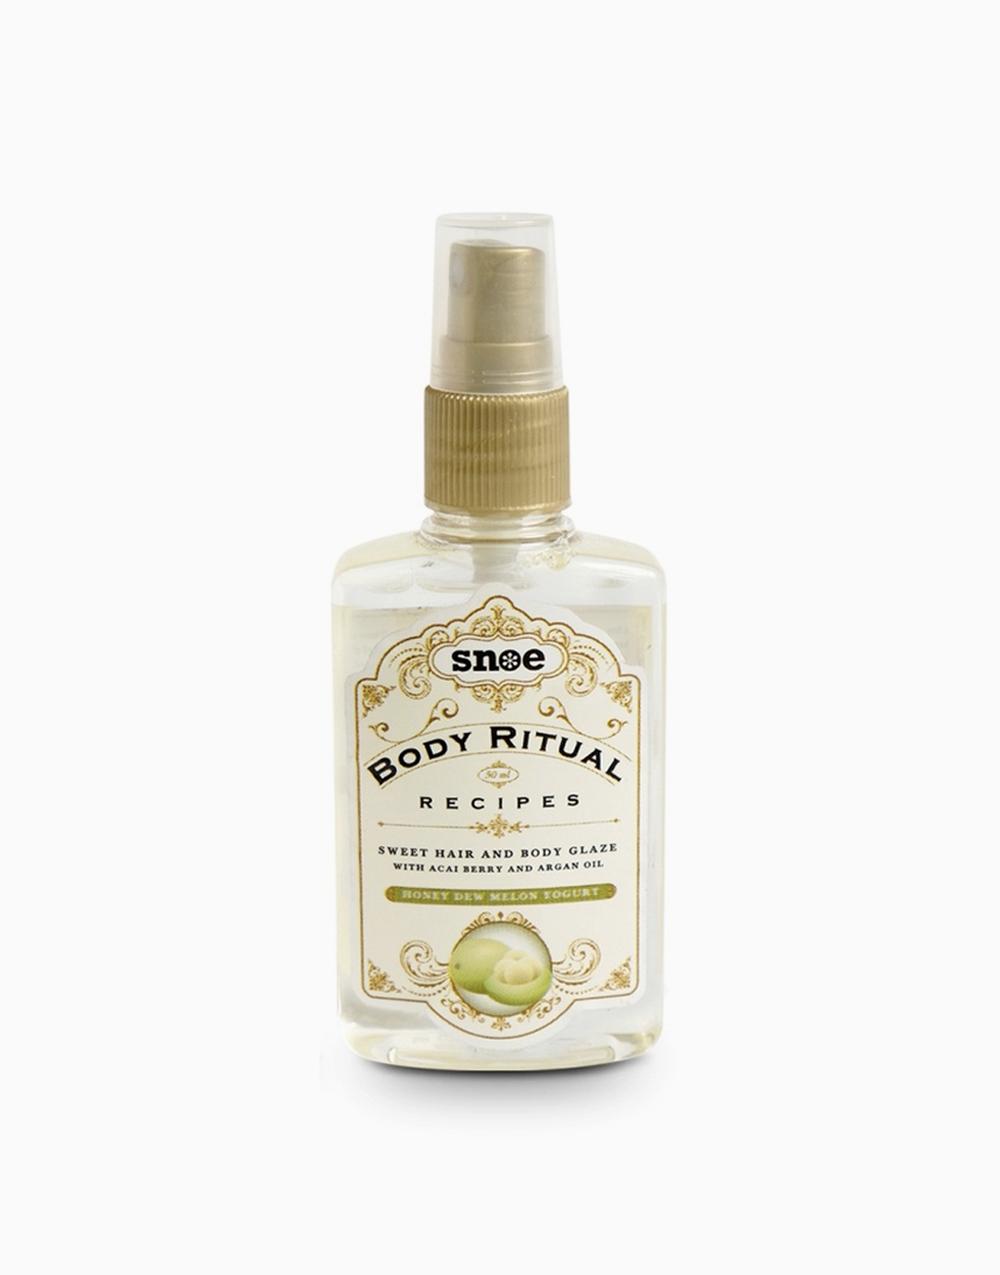 Body Ritual Recipes Sweet Hair & Body Glaze by Snoe Beauty | Honey Dew Melon Yogurt